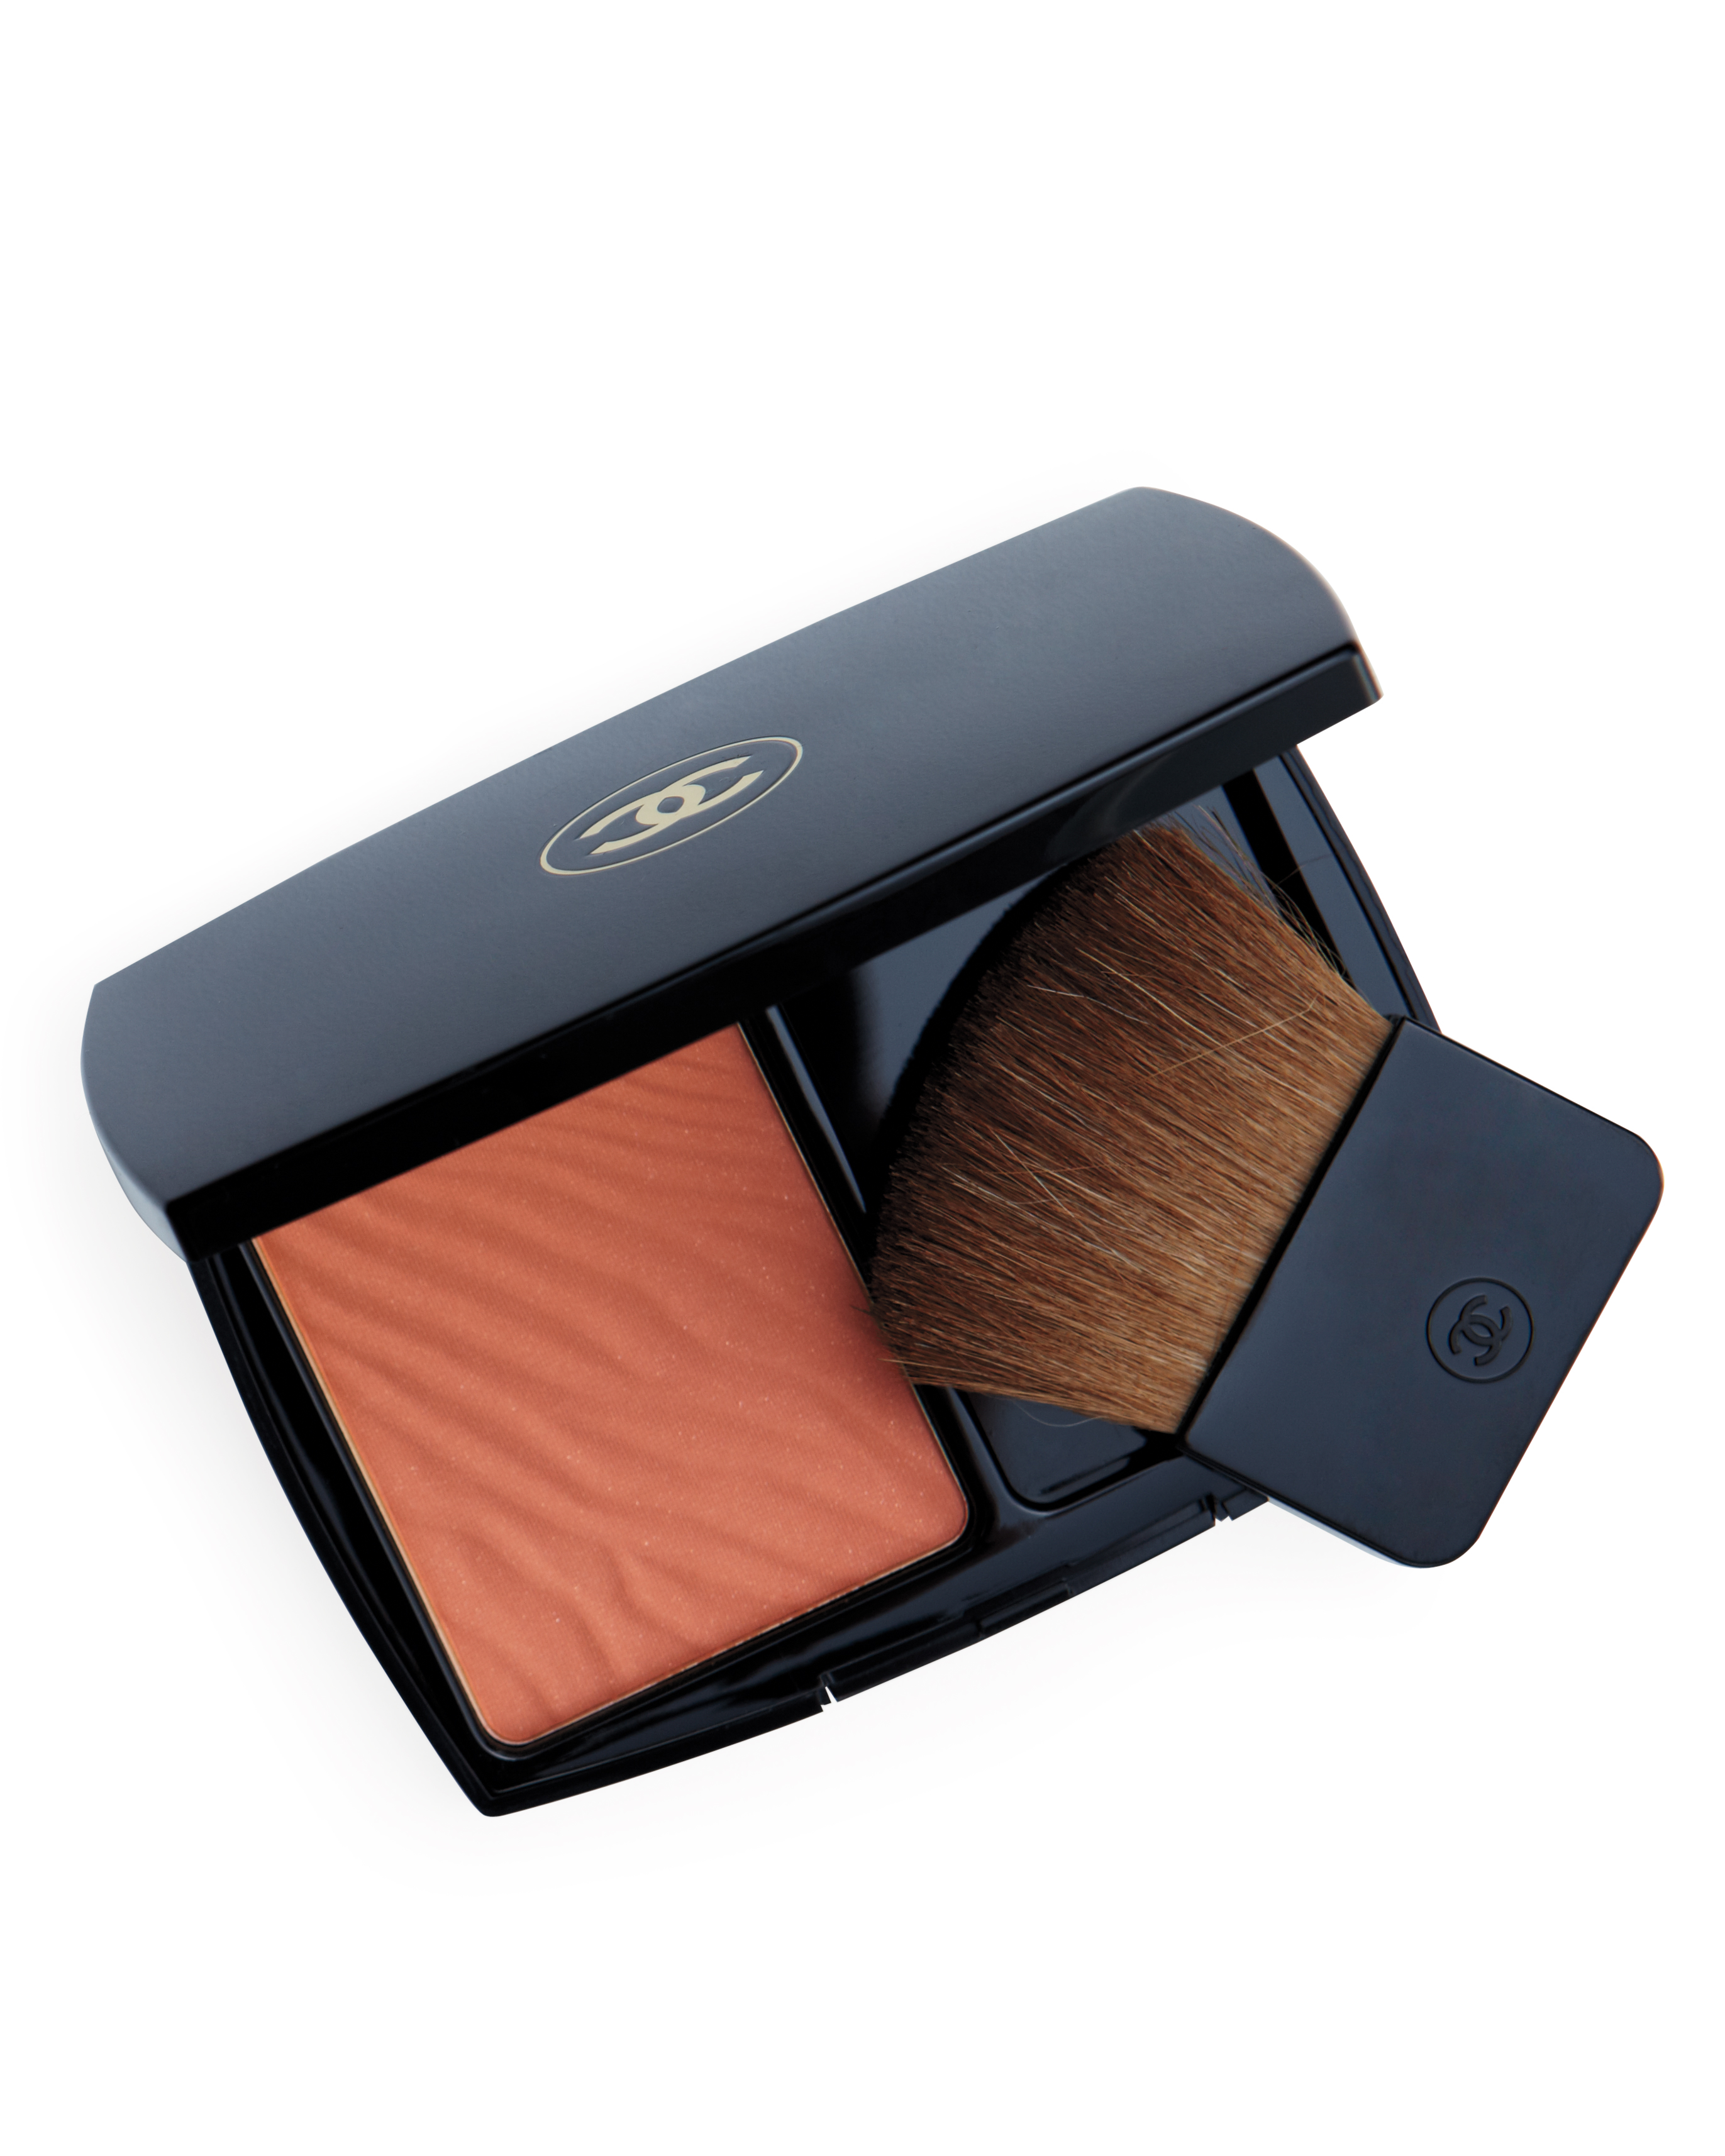 chanel-makeup-022-mwd109767.jpg